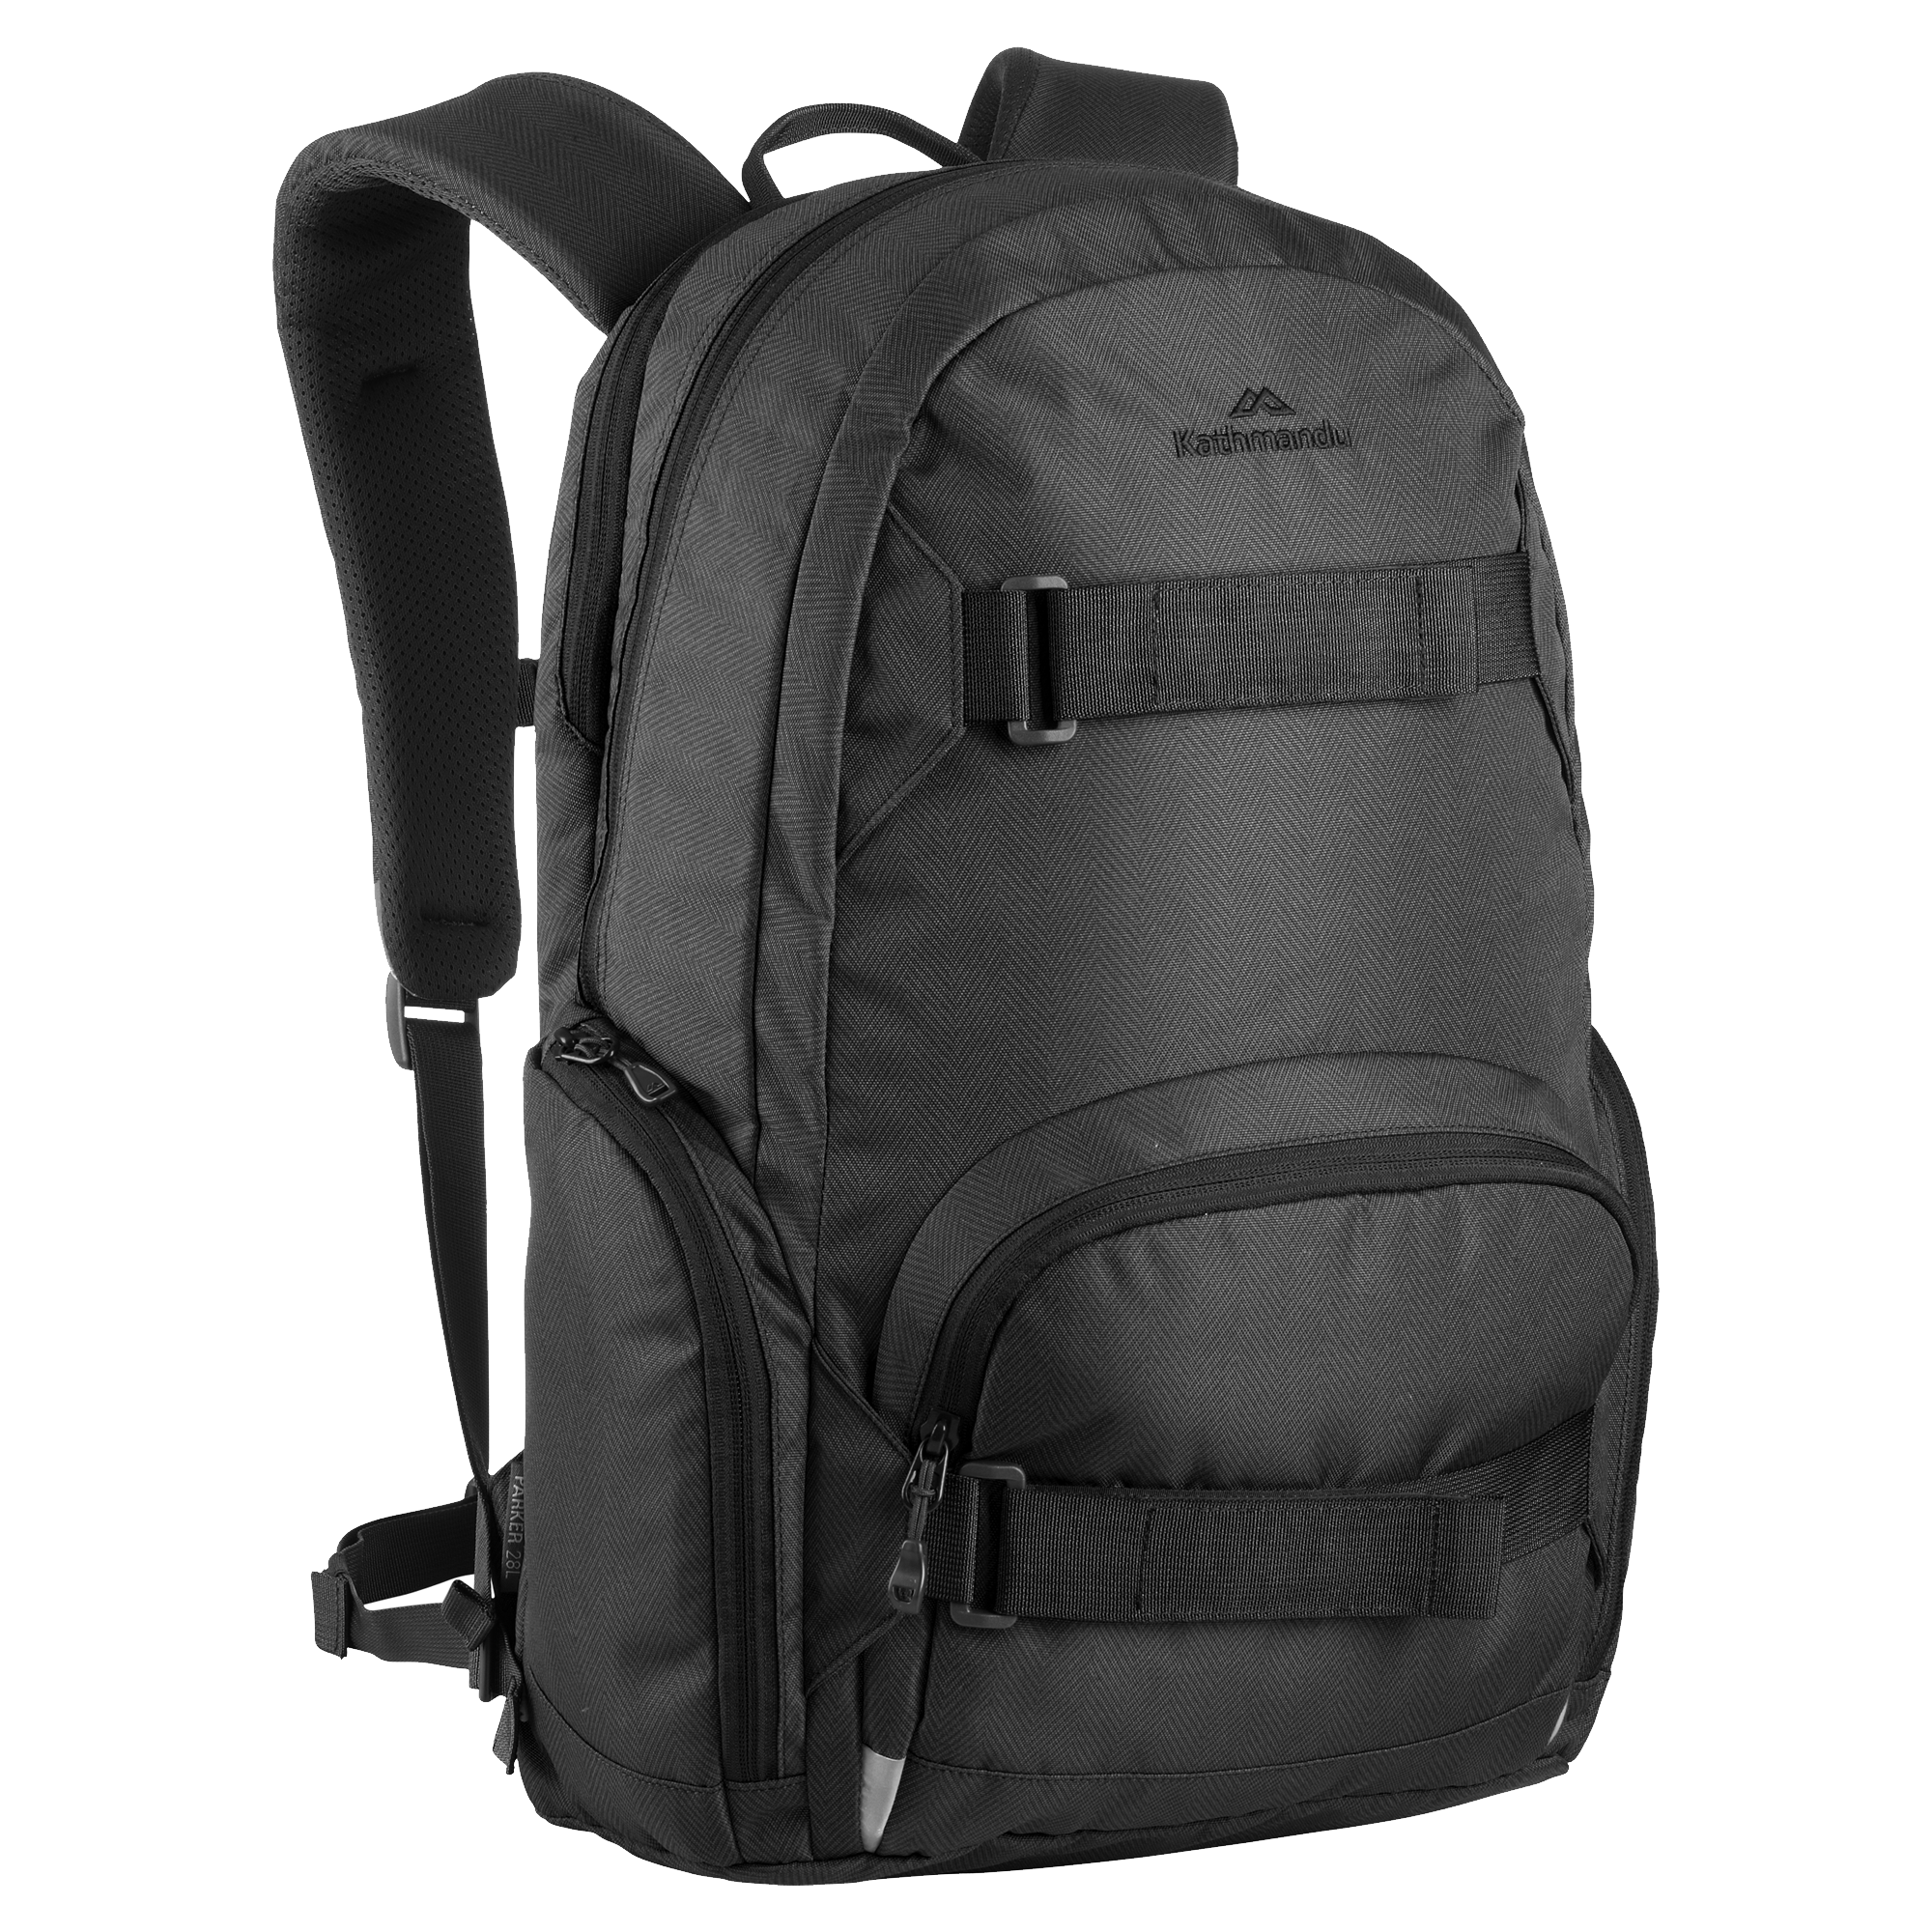 Kathmandu Black Backpack PNG Image.